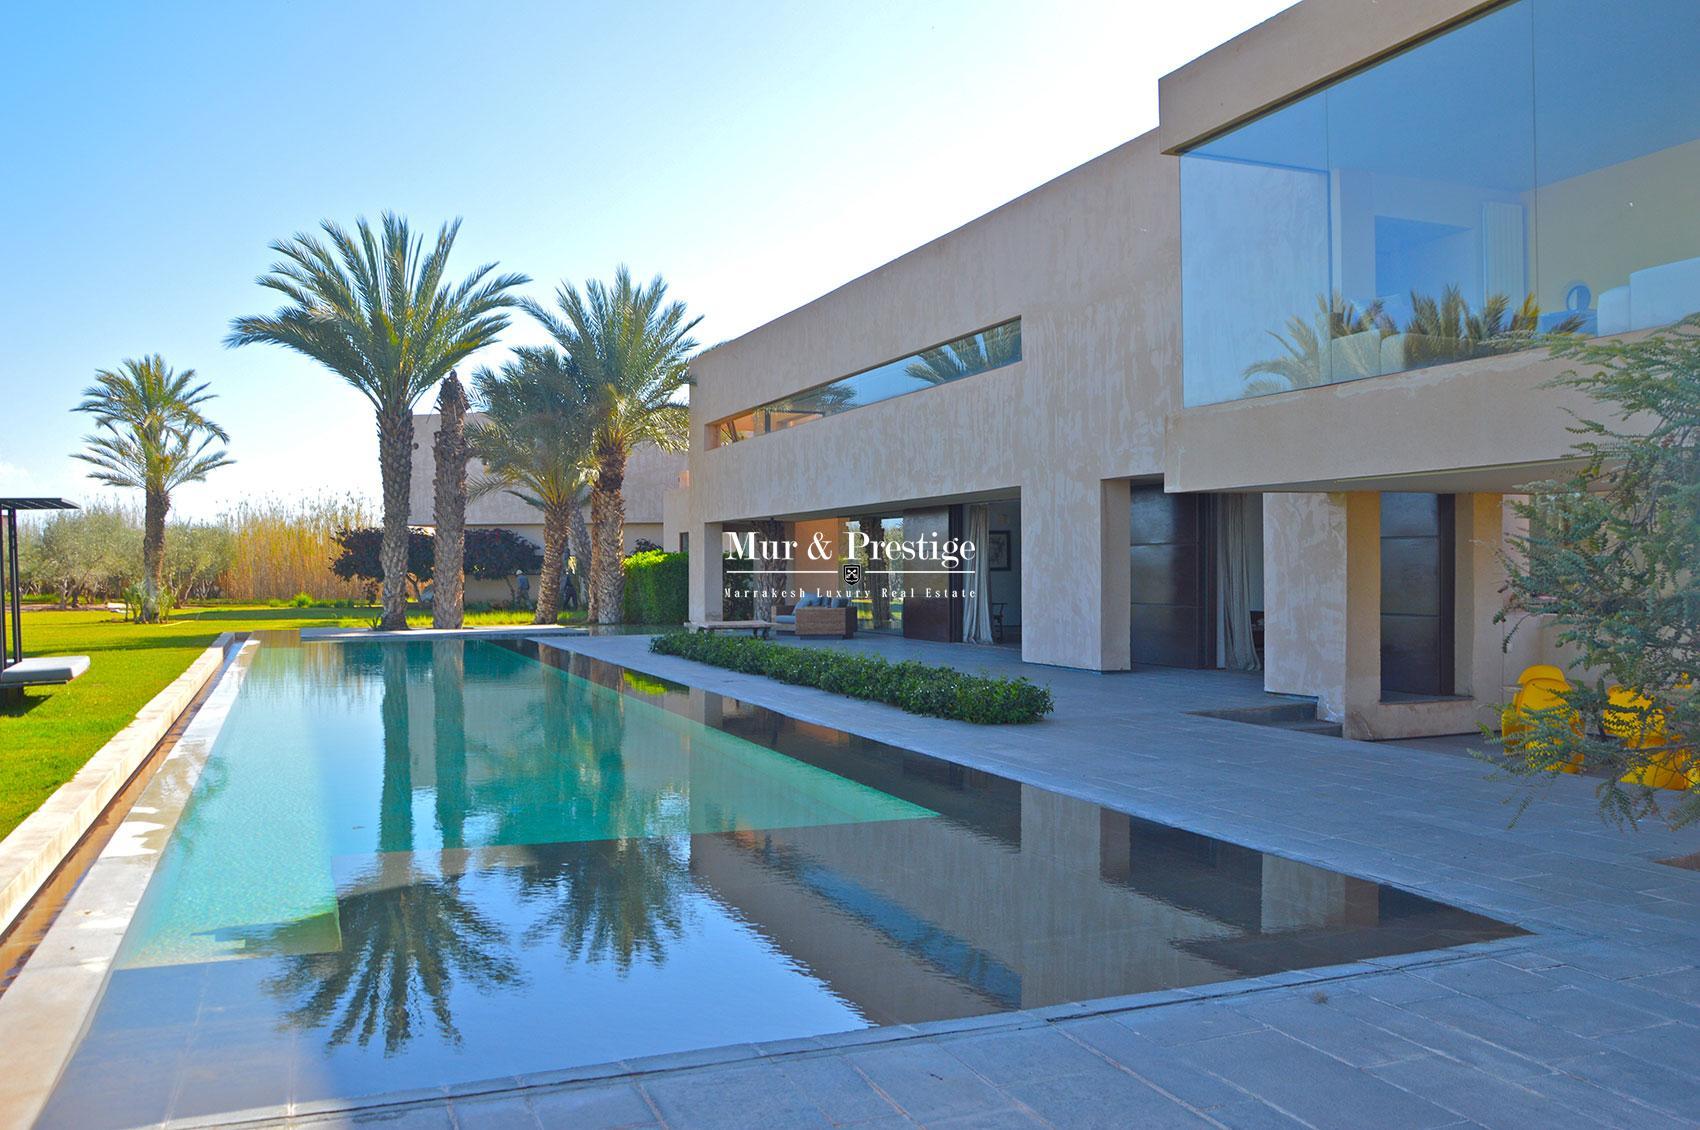 Achat villa de luxe marrakech for Achat villa de prestige